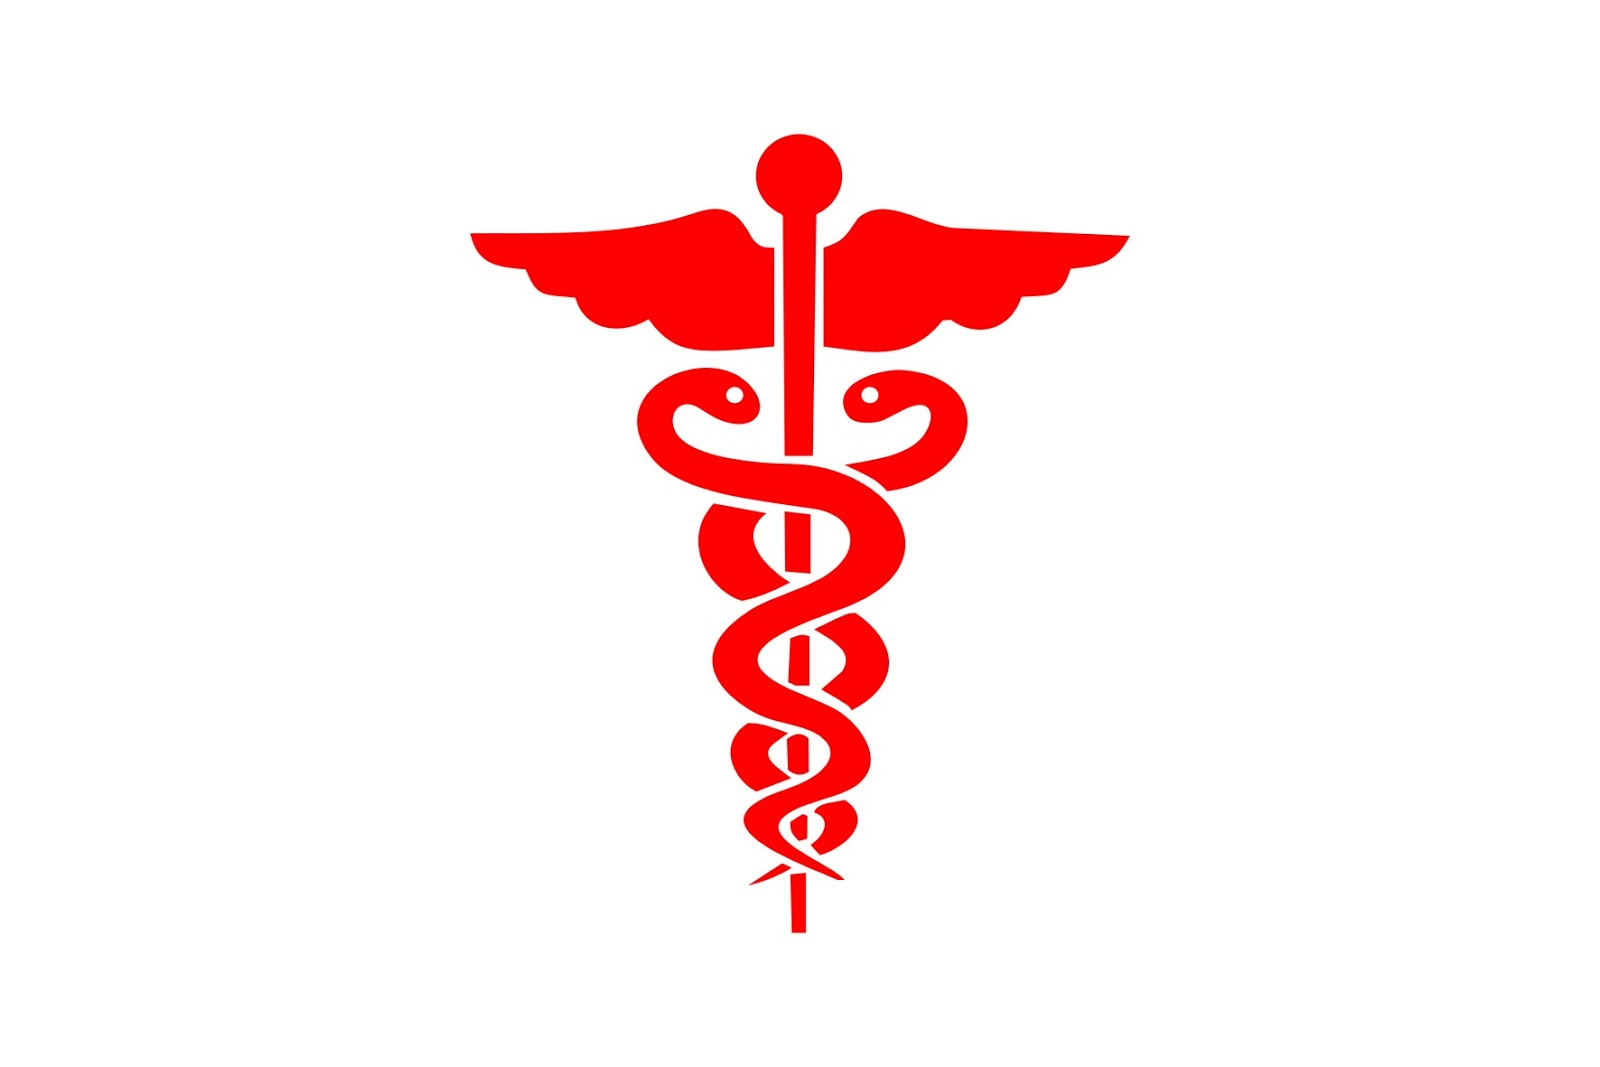 doc symbol logo